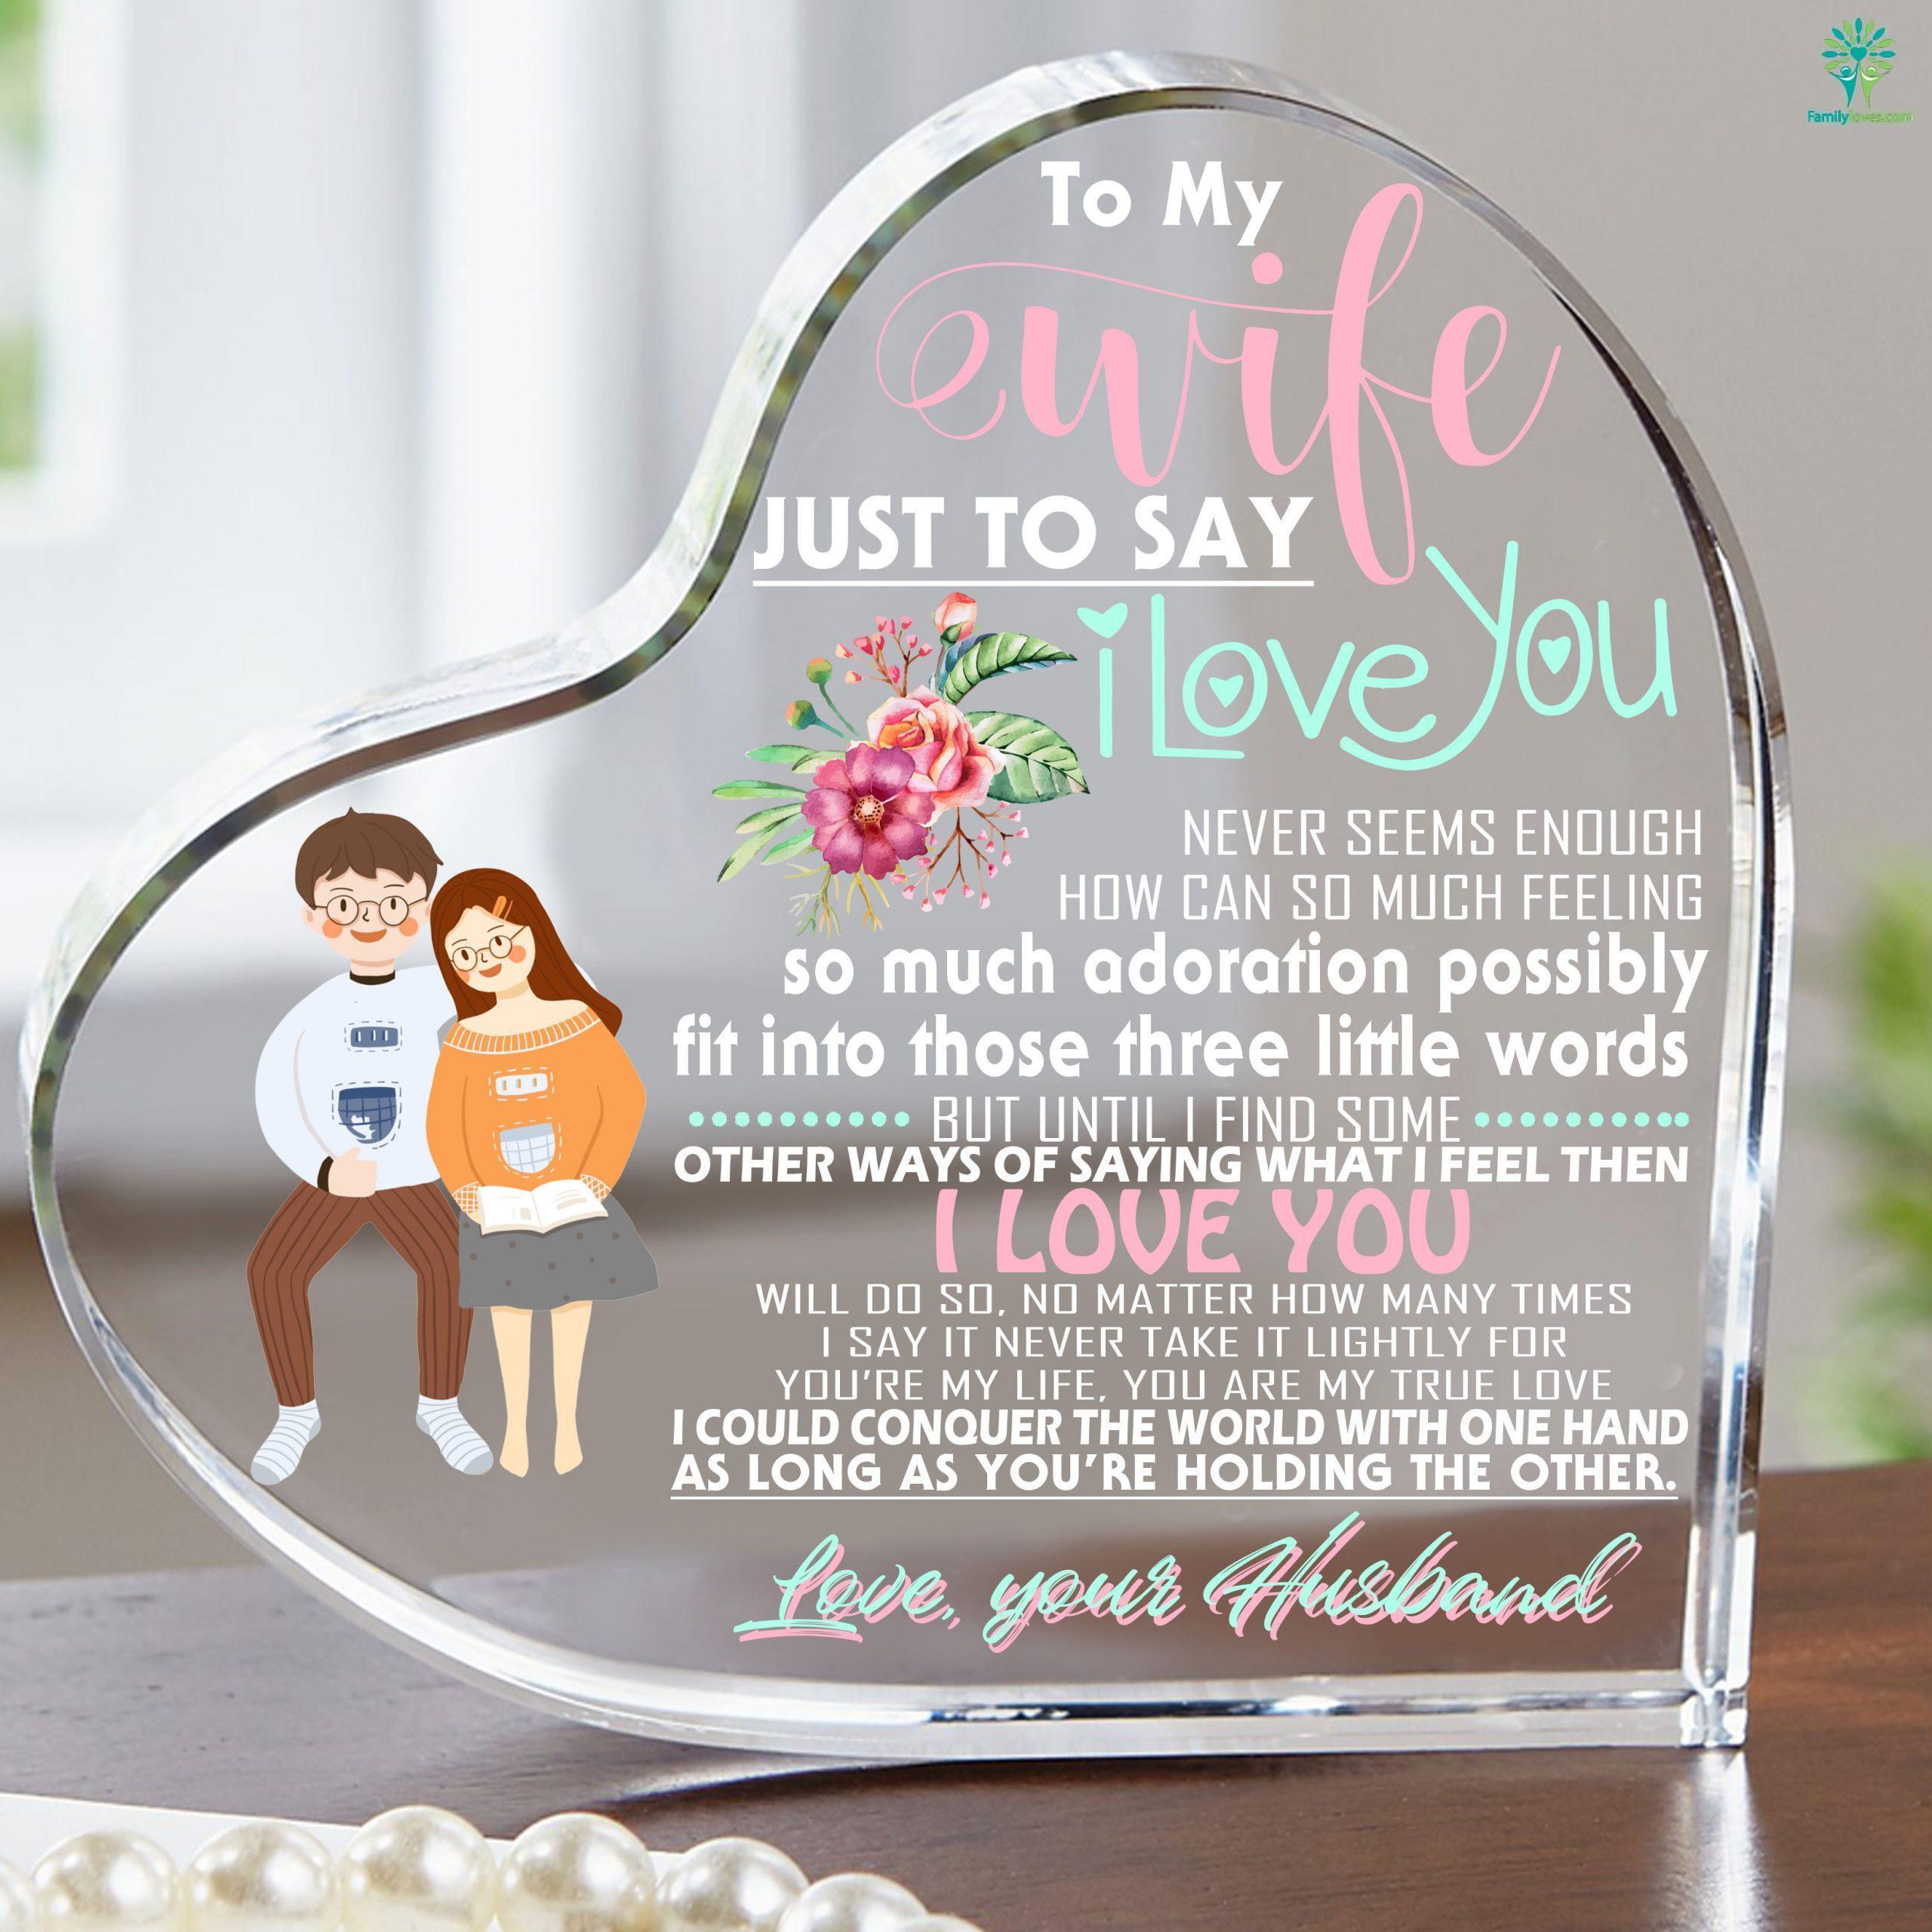 For My Wife Gifts Heart Keepsake Familyloves.com